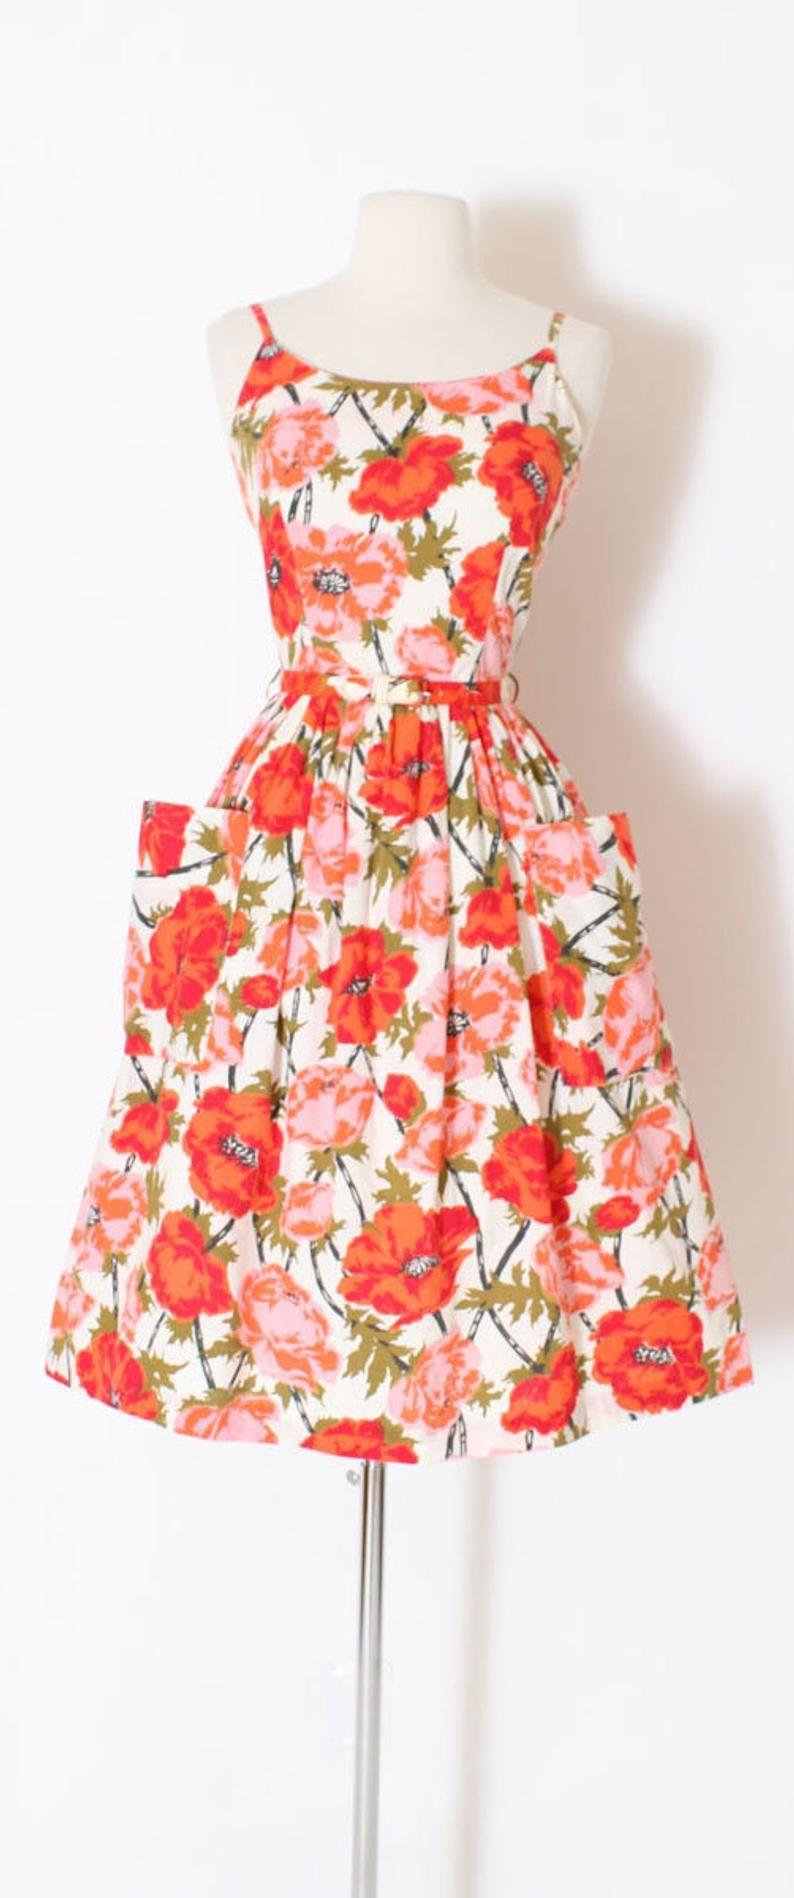 Vintage 1950s 50s Dress Orange Poppy Floral Print Belted Etsy Vintage Dresses Casual Lace Dress Vintage 50s Dresses [ 1898 x 794 Pixel ]